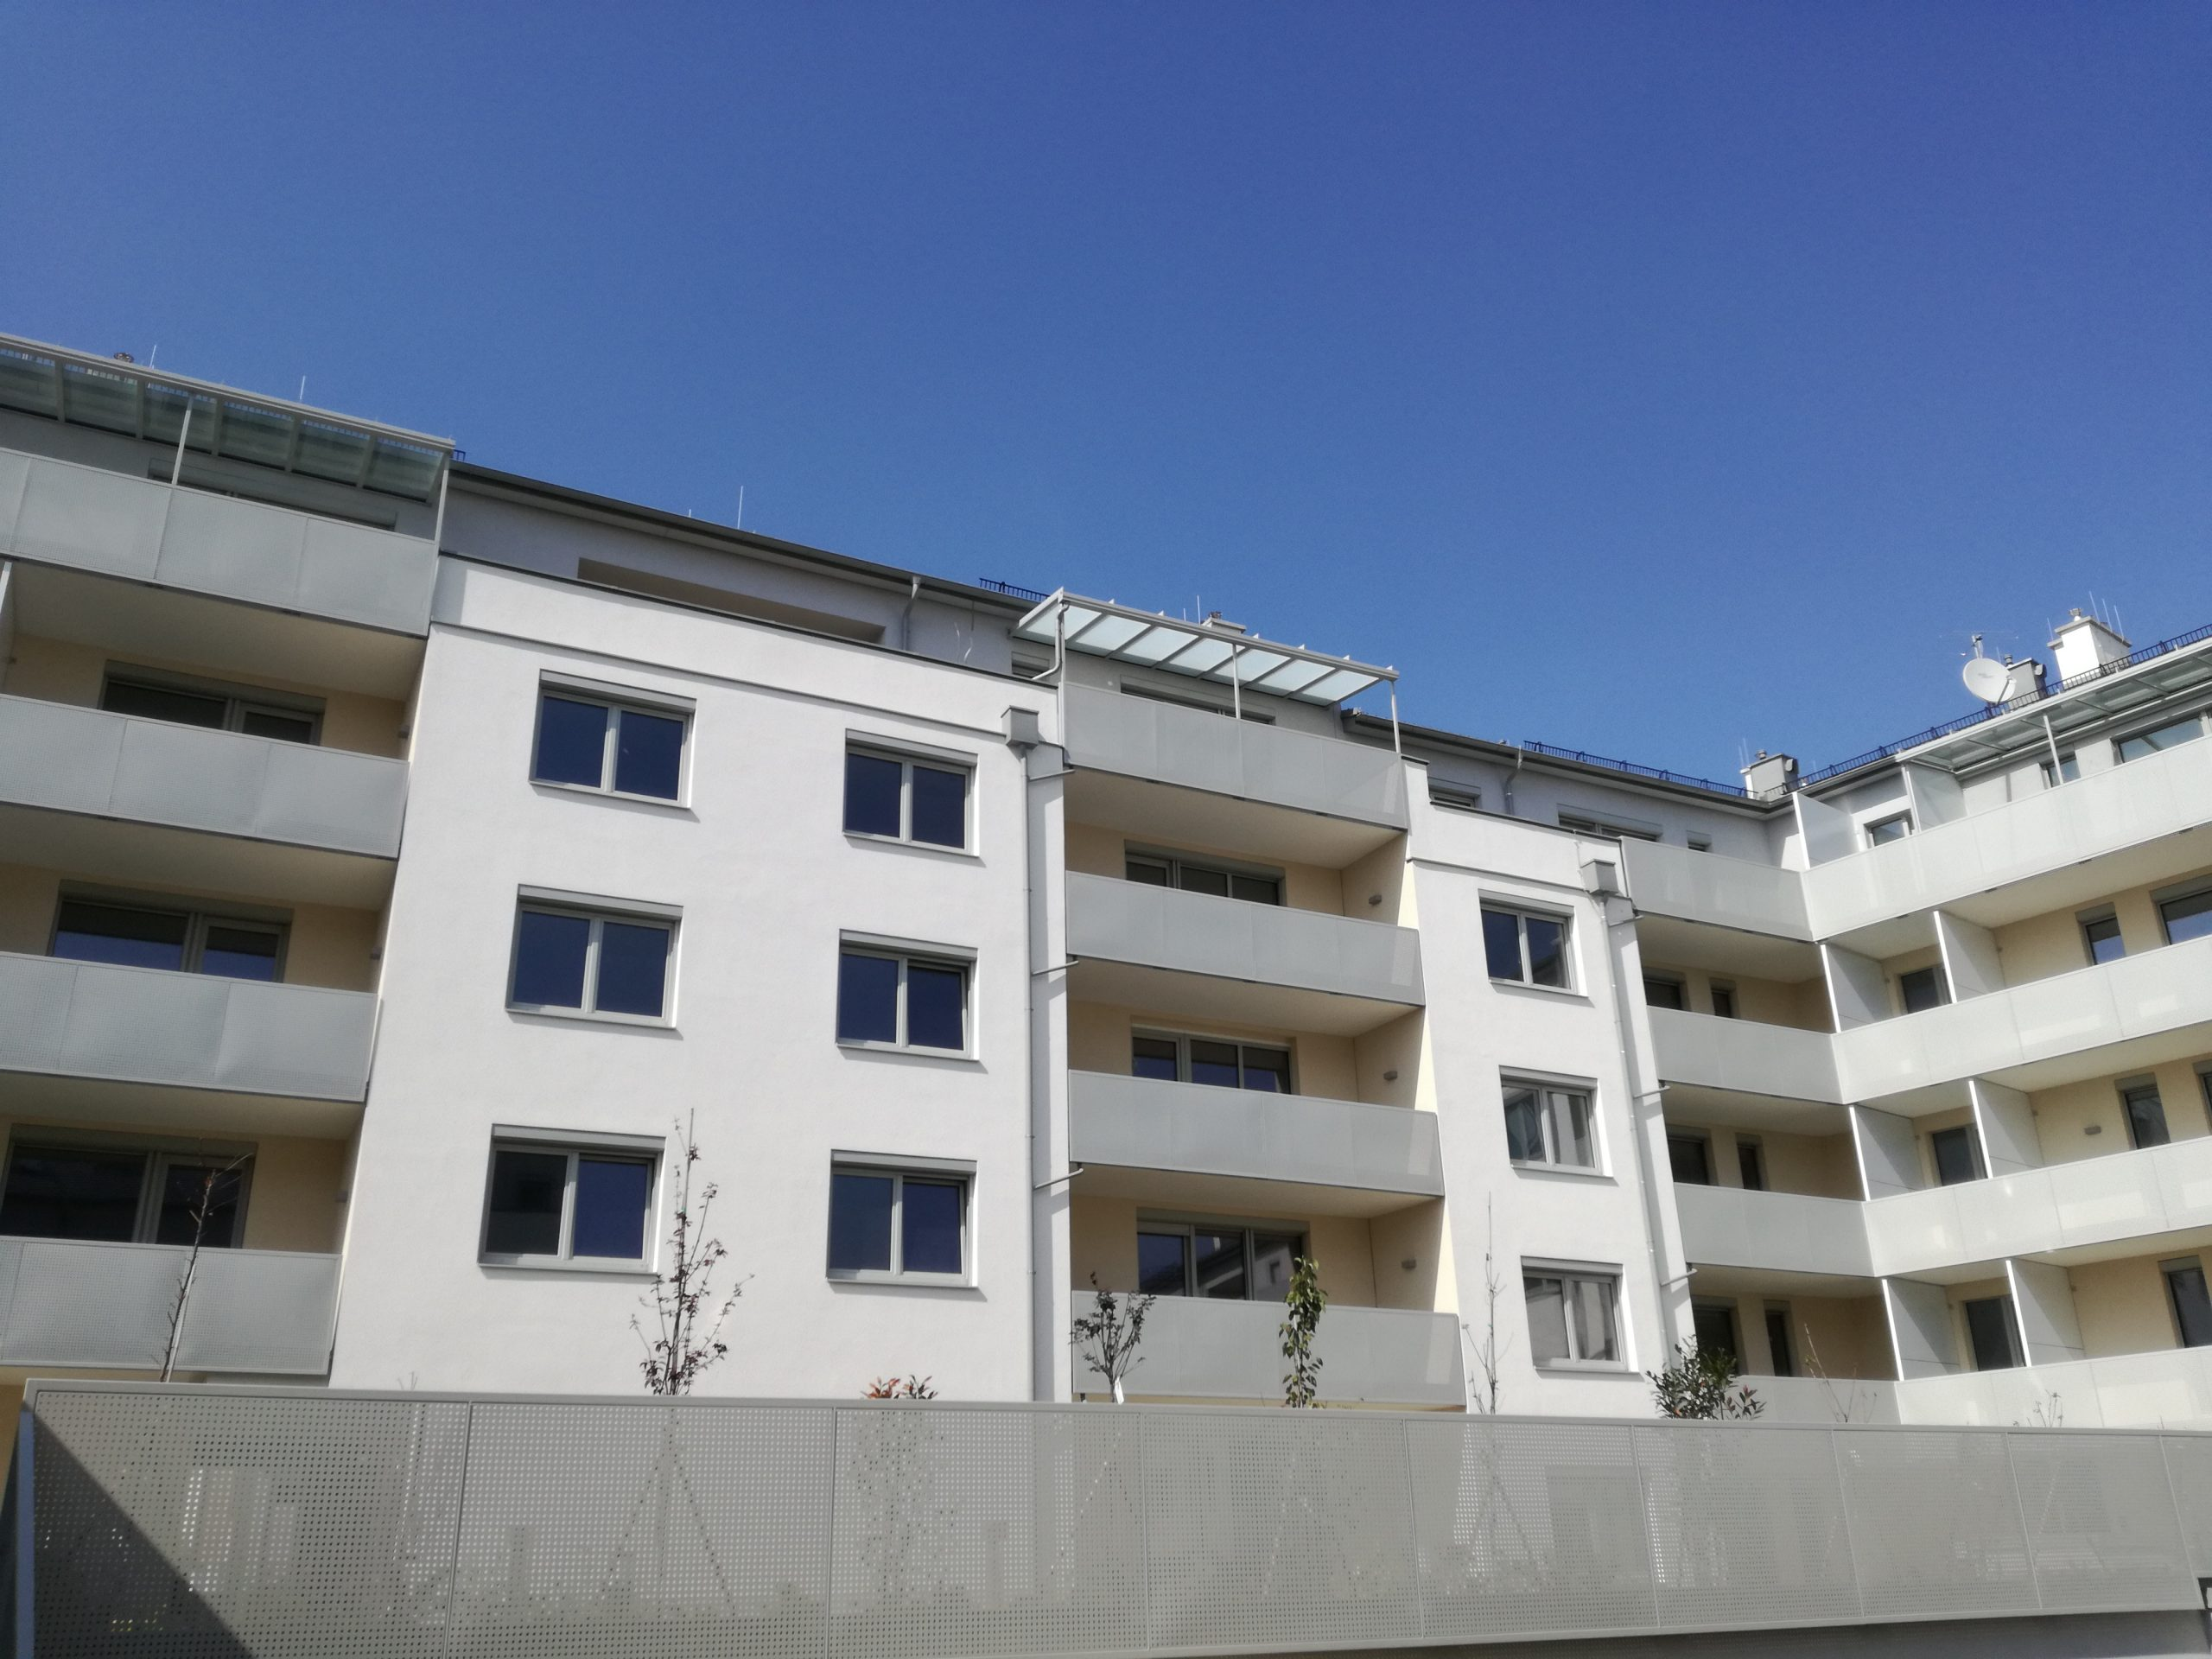 Immobilie von Kamptal in 2130 Mistelbach, Mistelbach, Mistelbach X/1 & X/2 - Top 205 #5